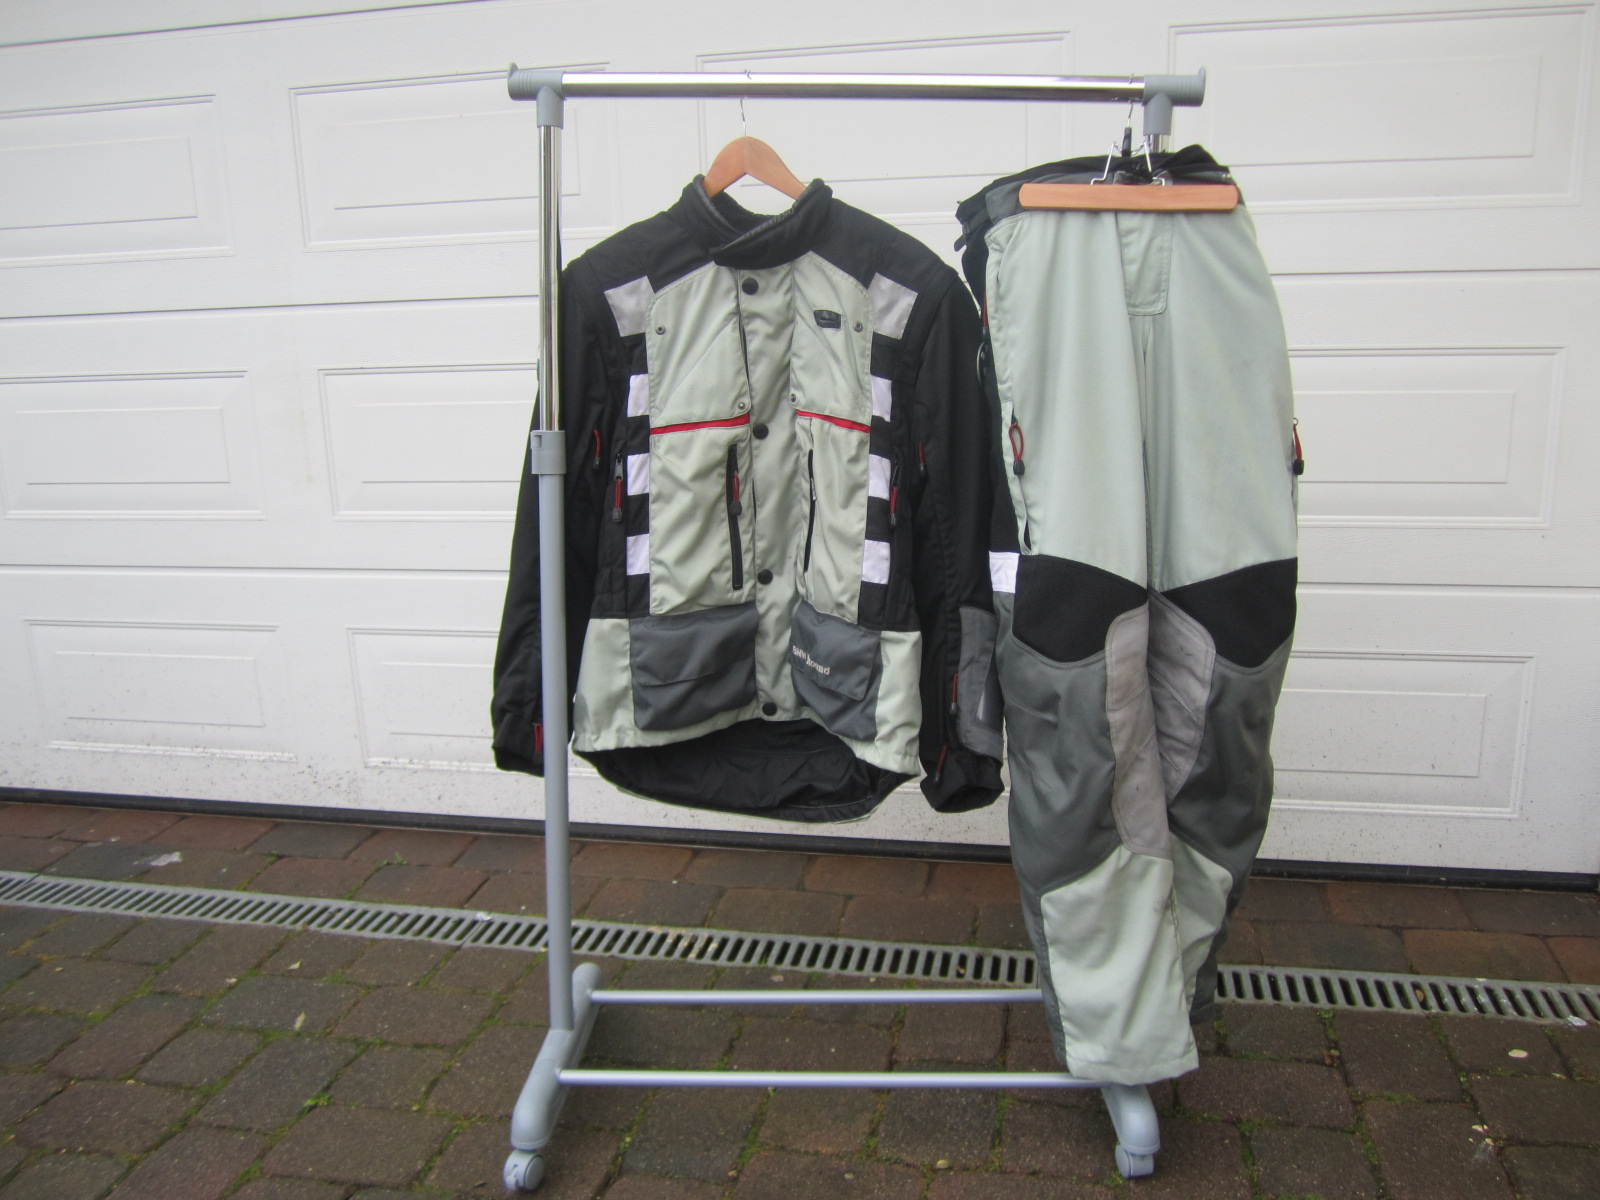 biete sonstiges anzug bmw rallye 2 pro gr 54 grau schwarz. Black Bedroom Furniture Sets. Home Design Ideas